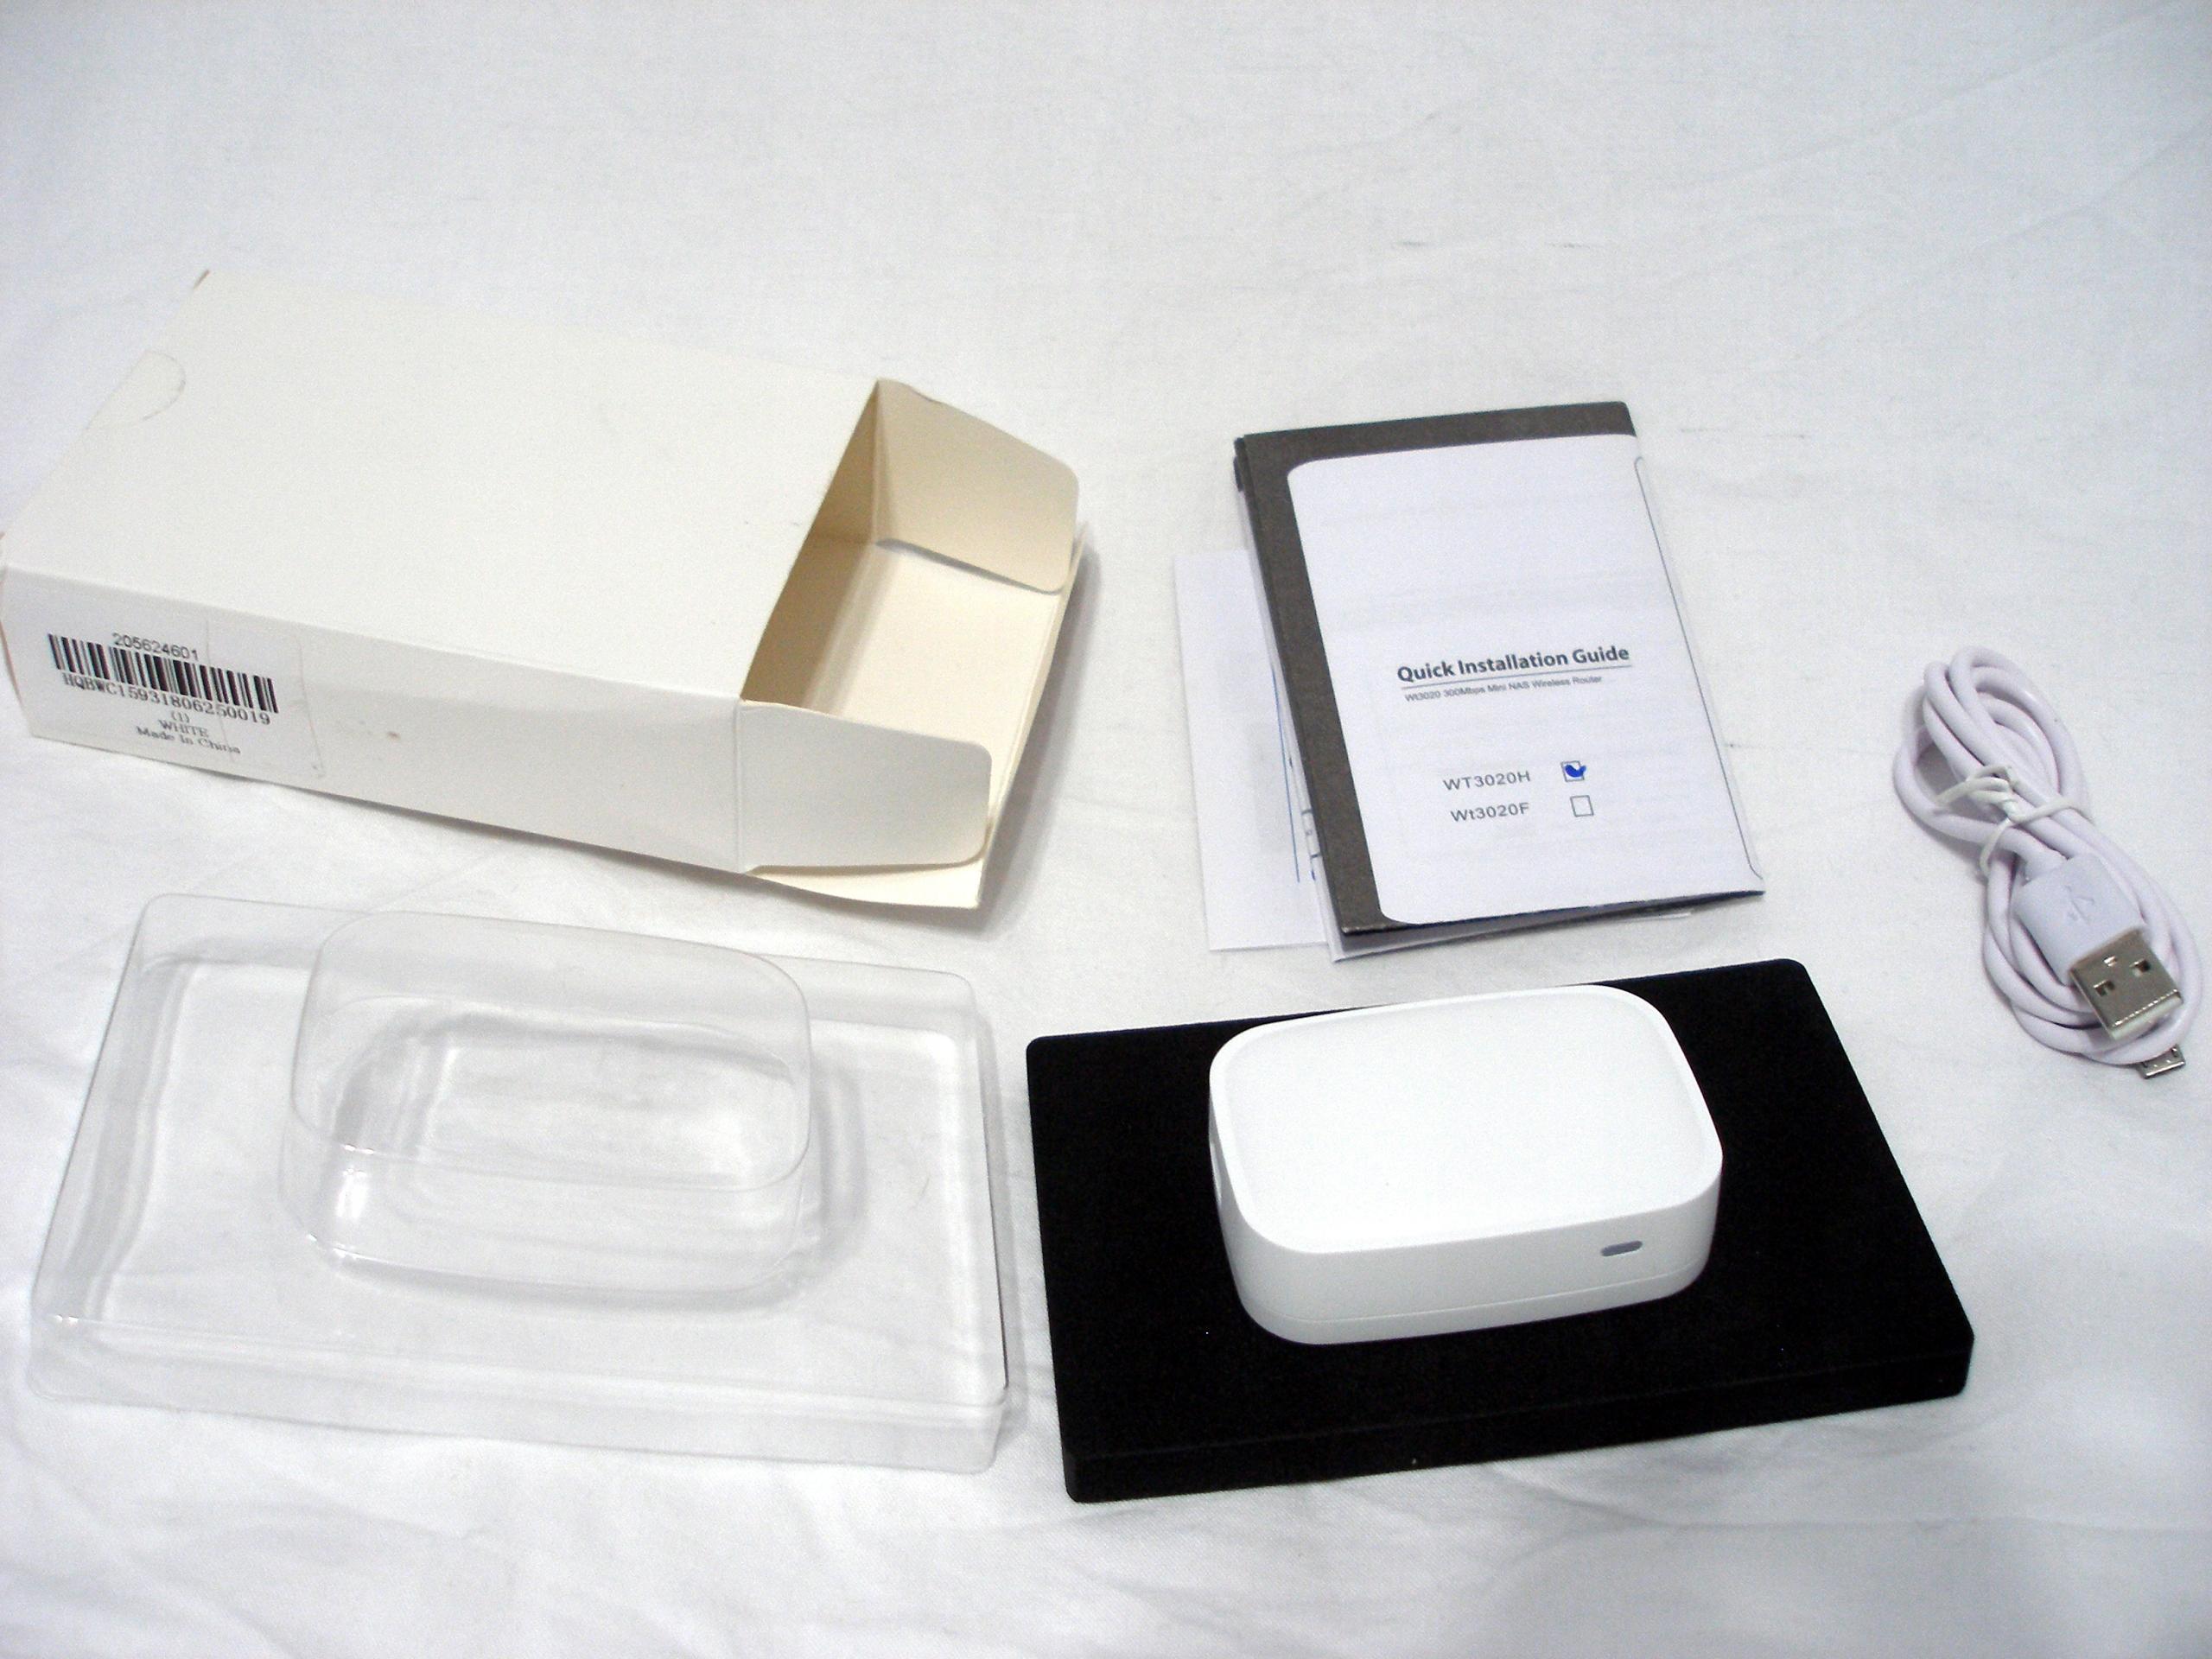 Mini Router WiFi WT3020H Nexx WT3020 OpenWrt USB - 7687058766